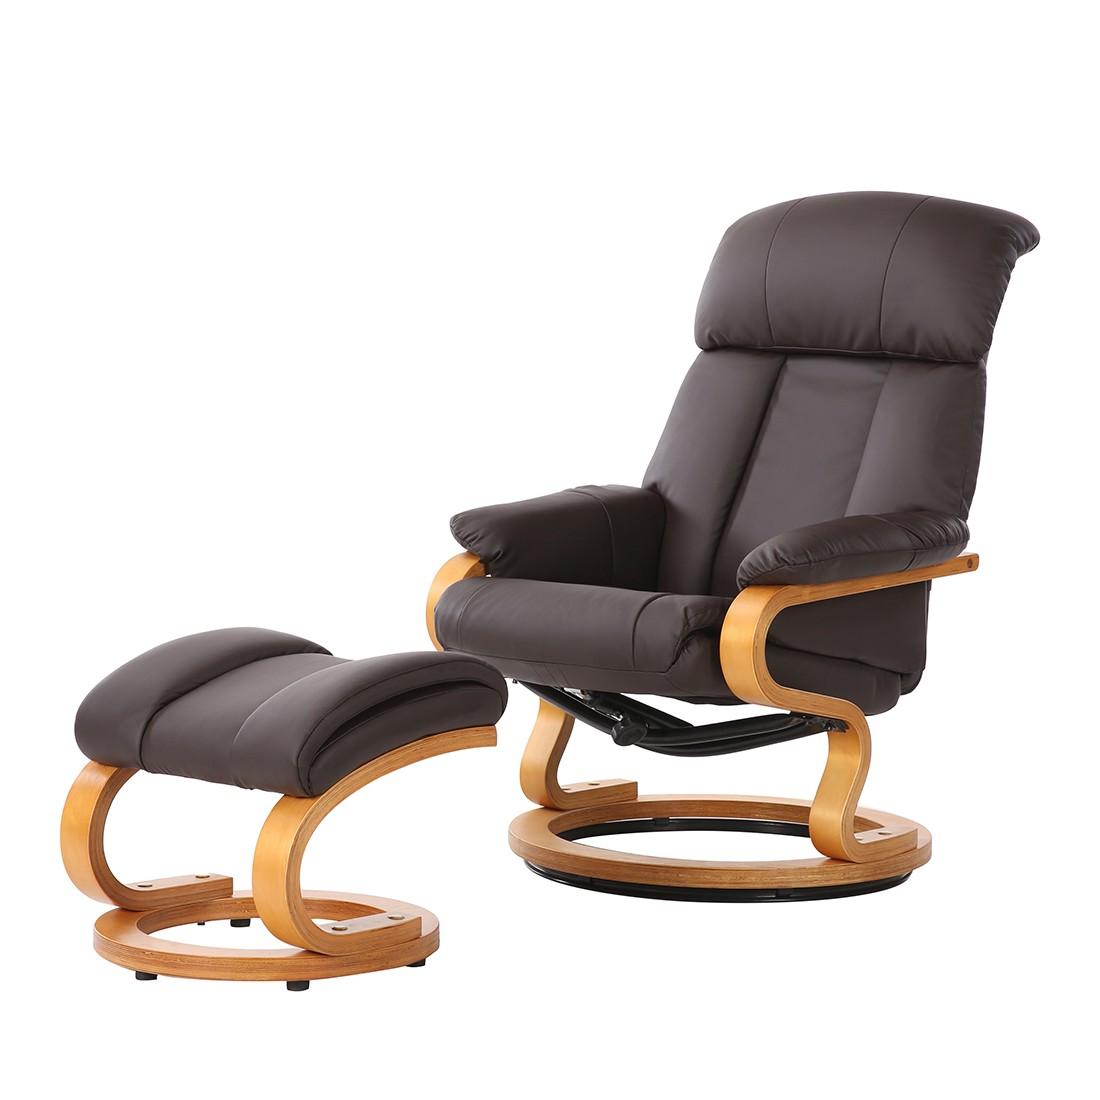 Fauteuil de relaxation Barosa (avec repose-pieds) - Imitation cuir - Marron, Nuovoform